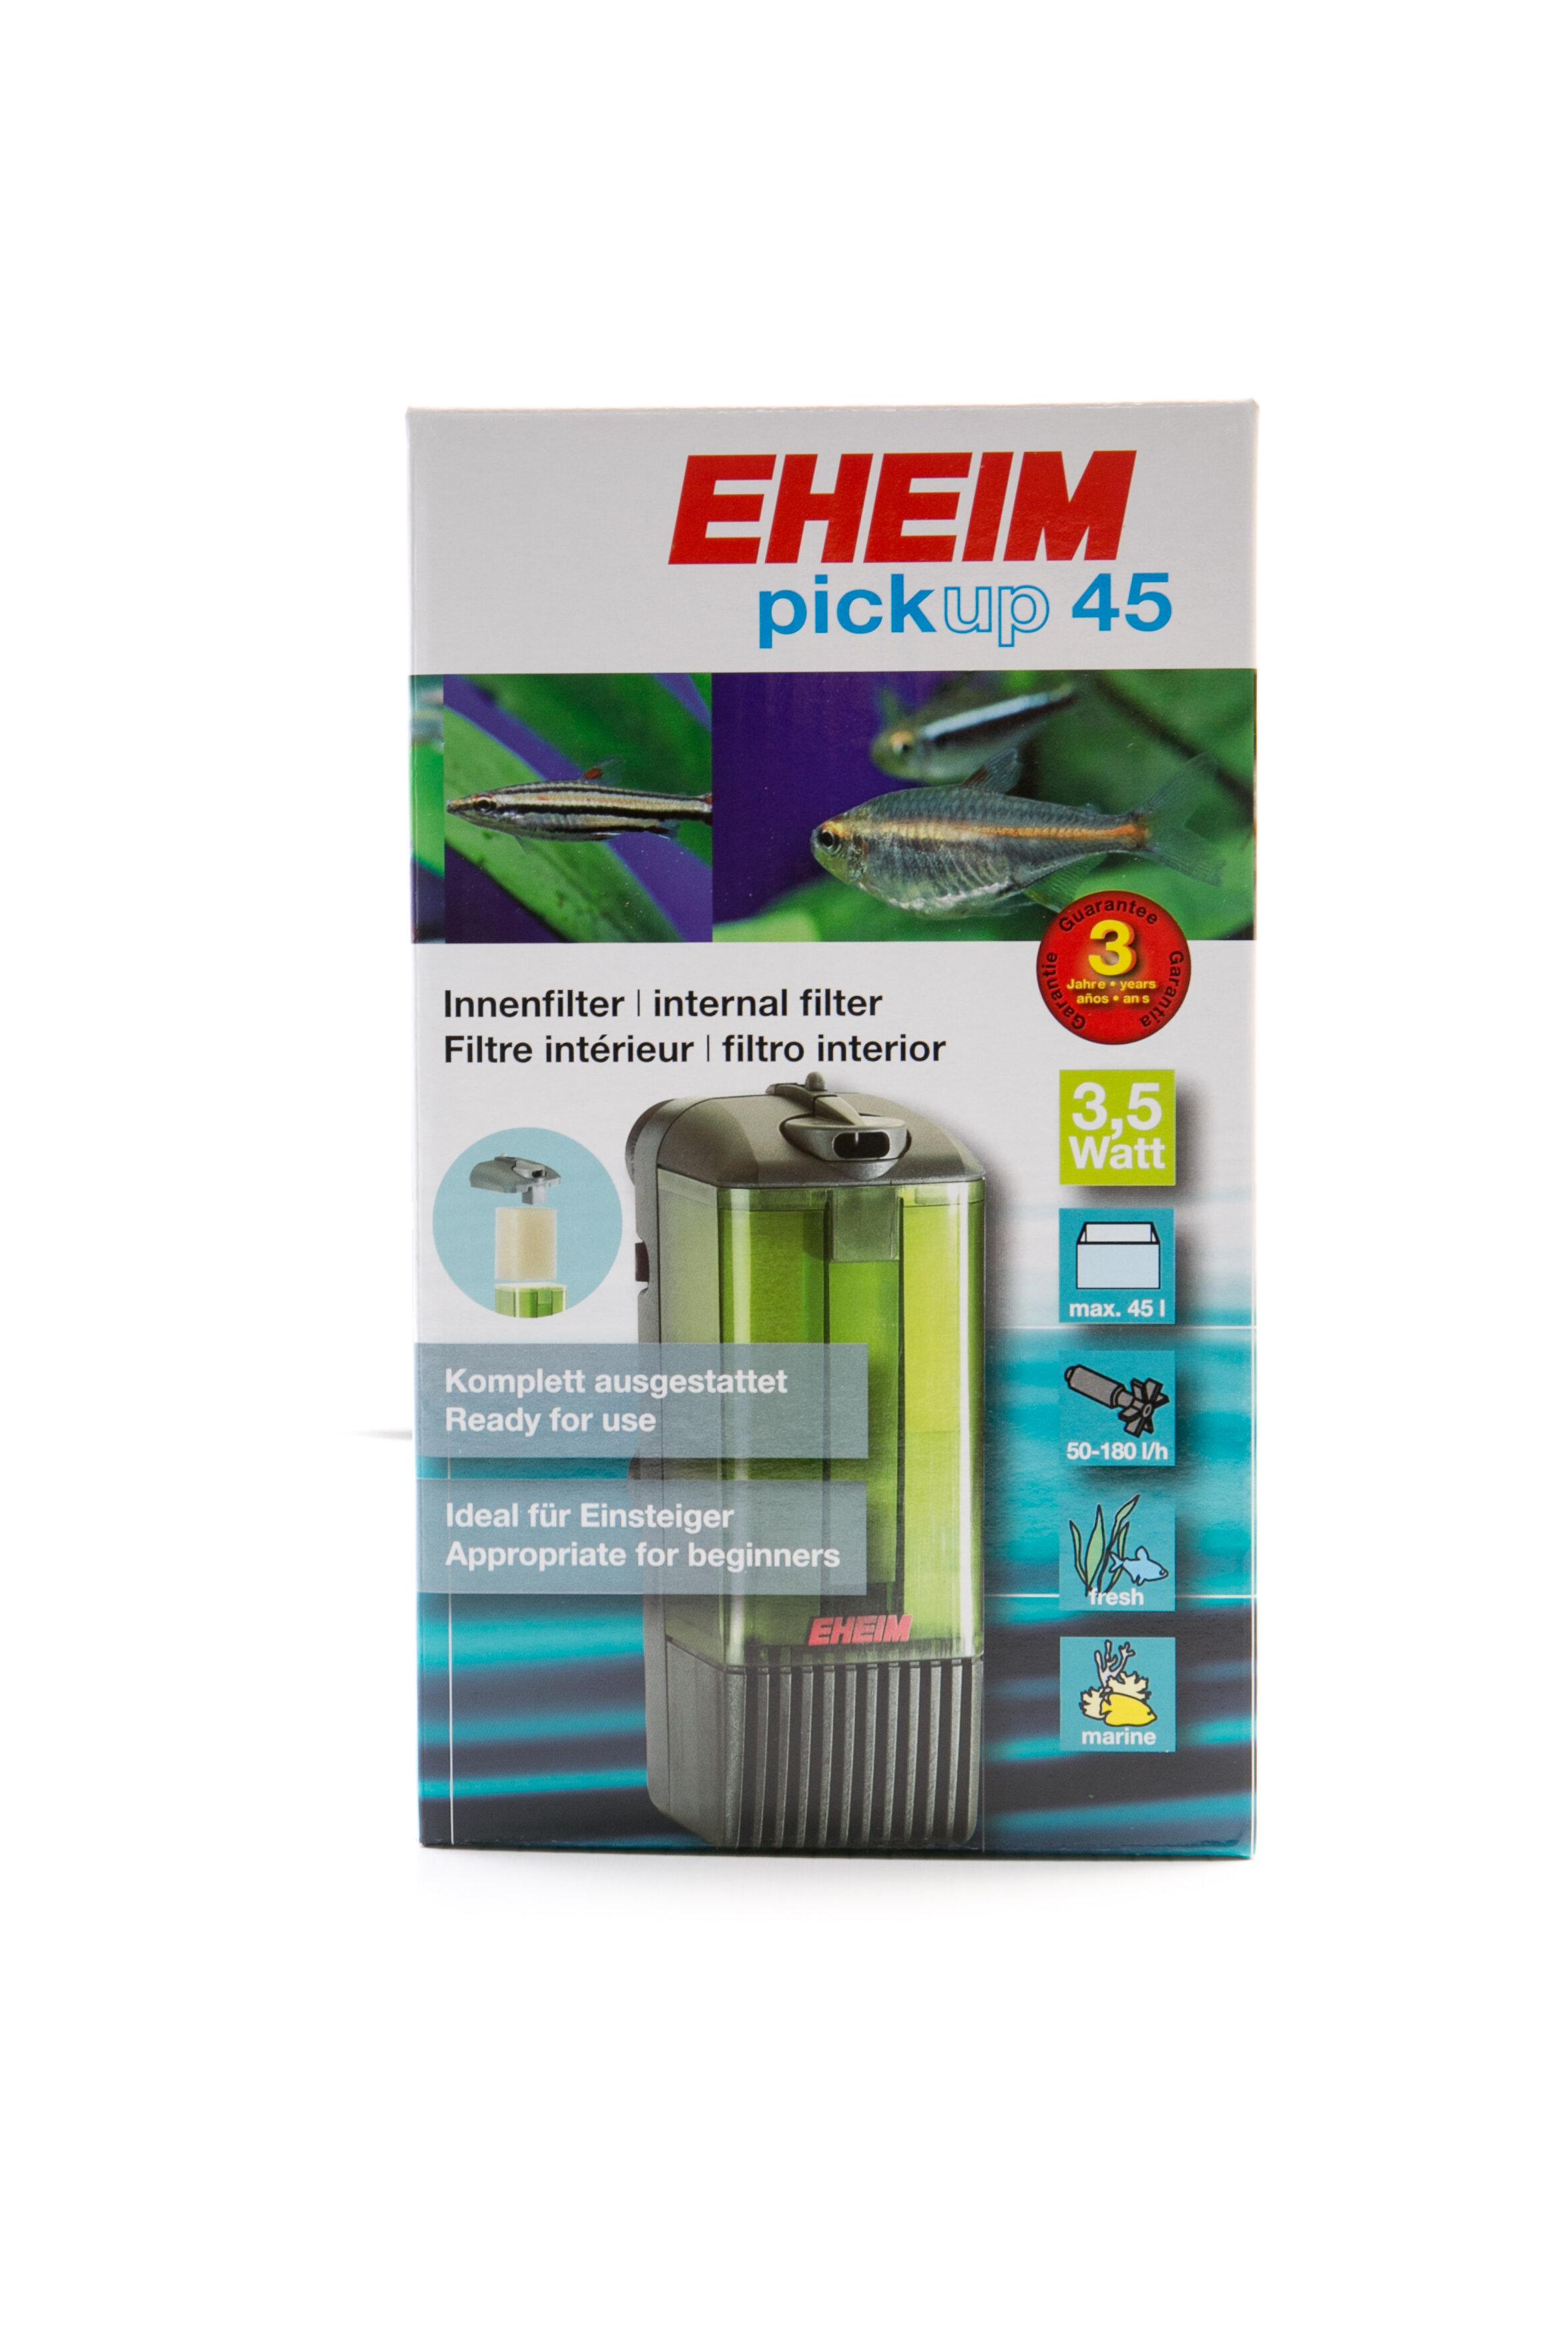 Pickup 45 Internal Filter - Fish-Filters & Media-Filters : Pet.kiwi ...